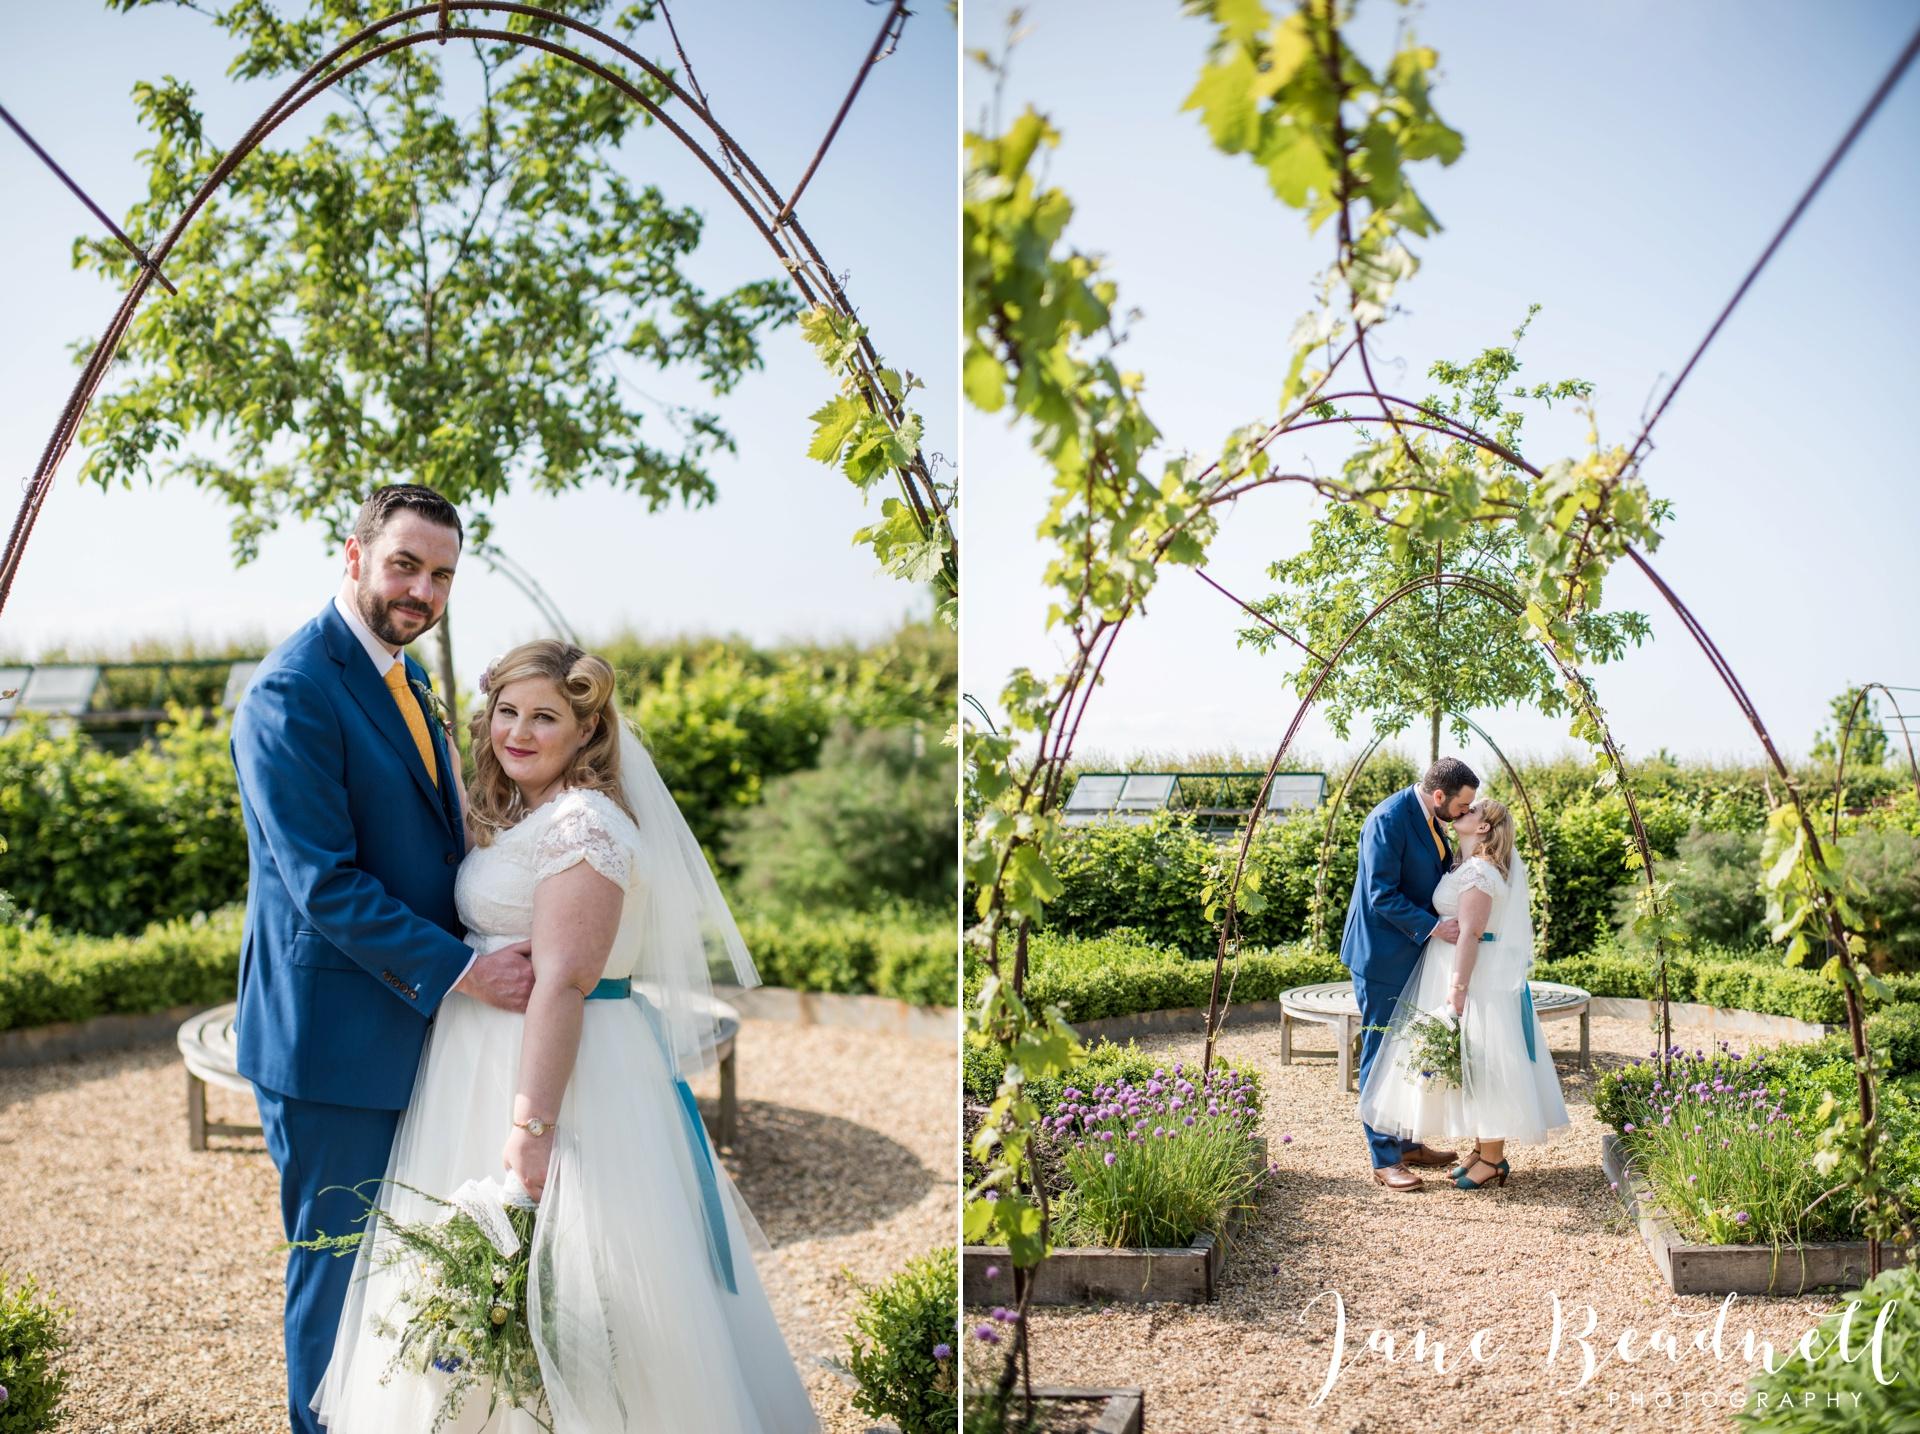 South Farm Wedding photography Hertfordshire by Jane Beadnell Photography fine art wedding photographer_0122